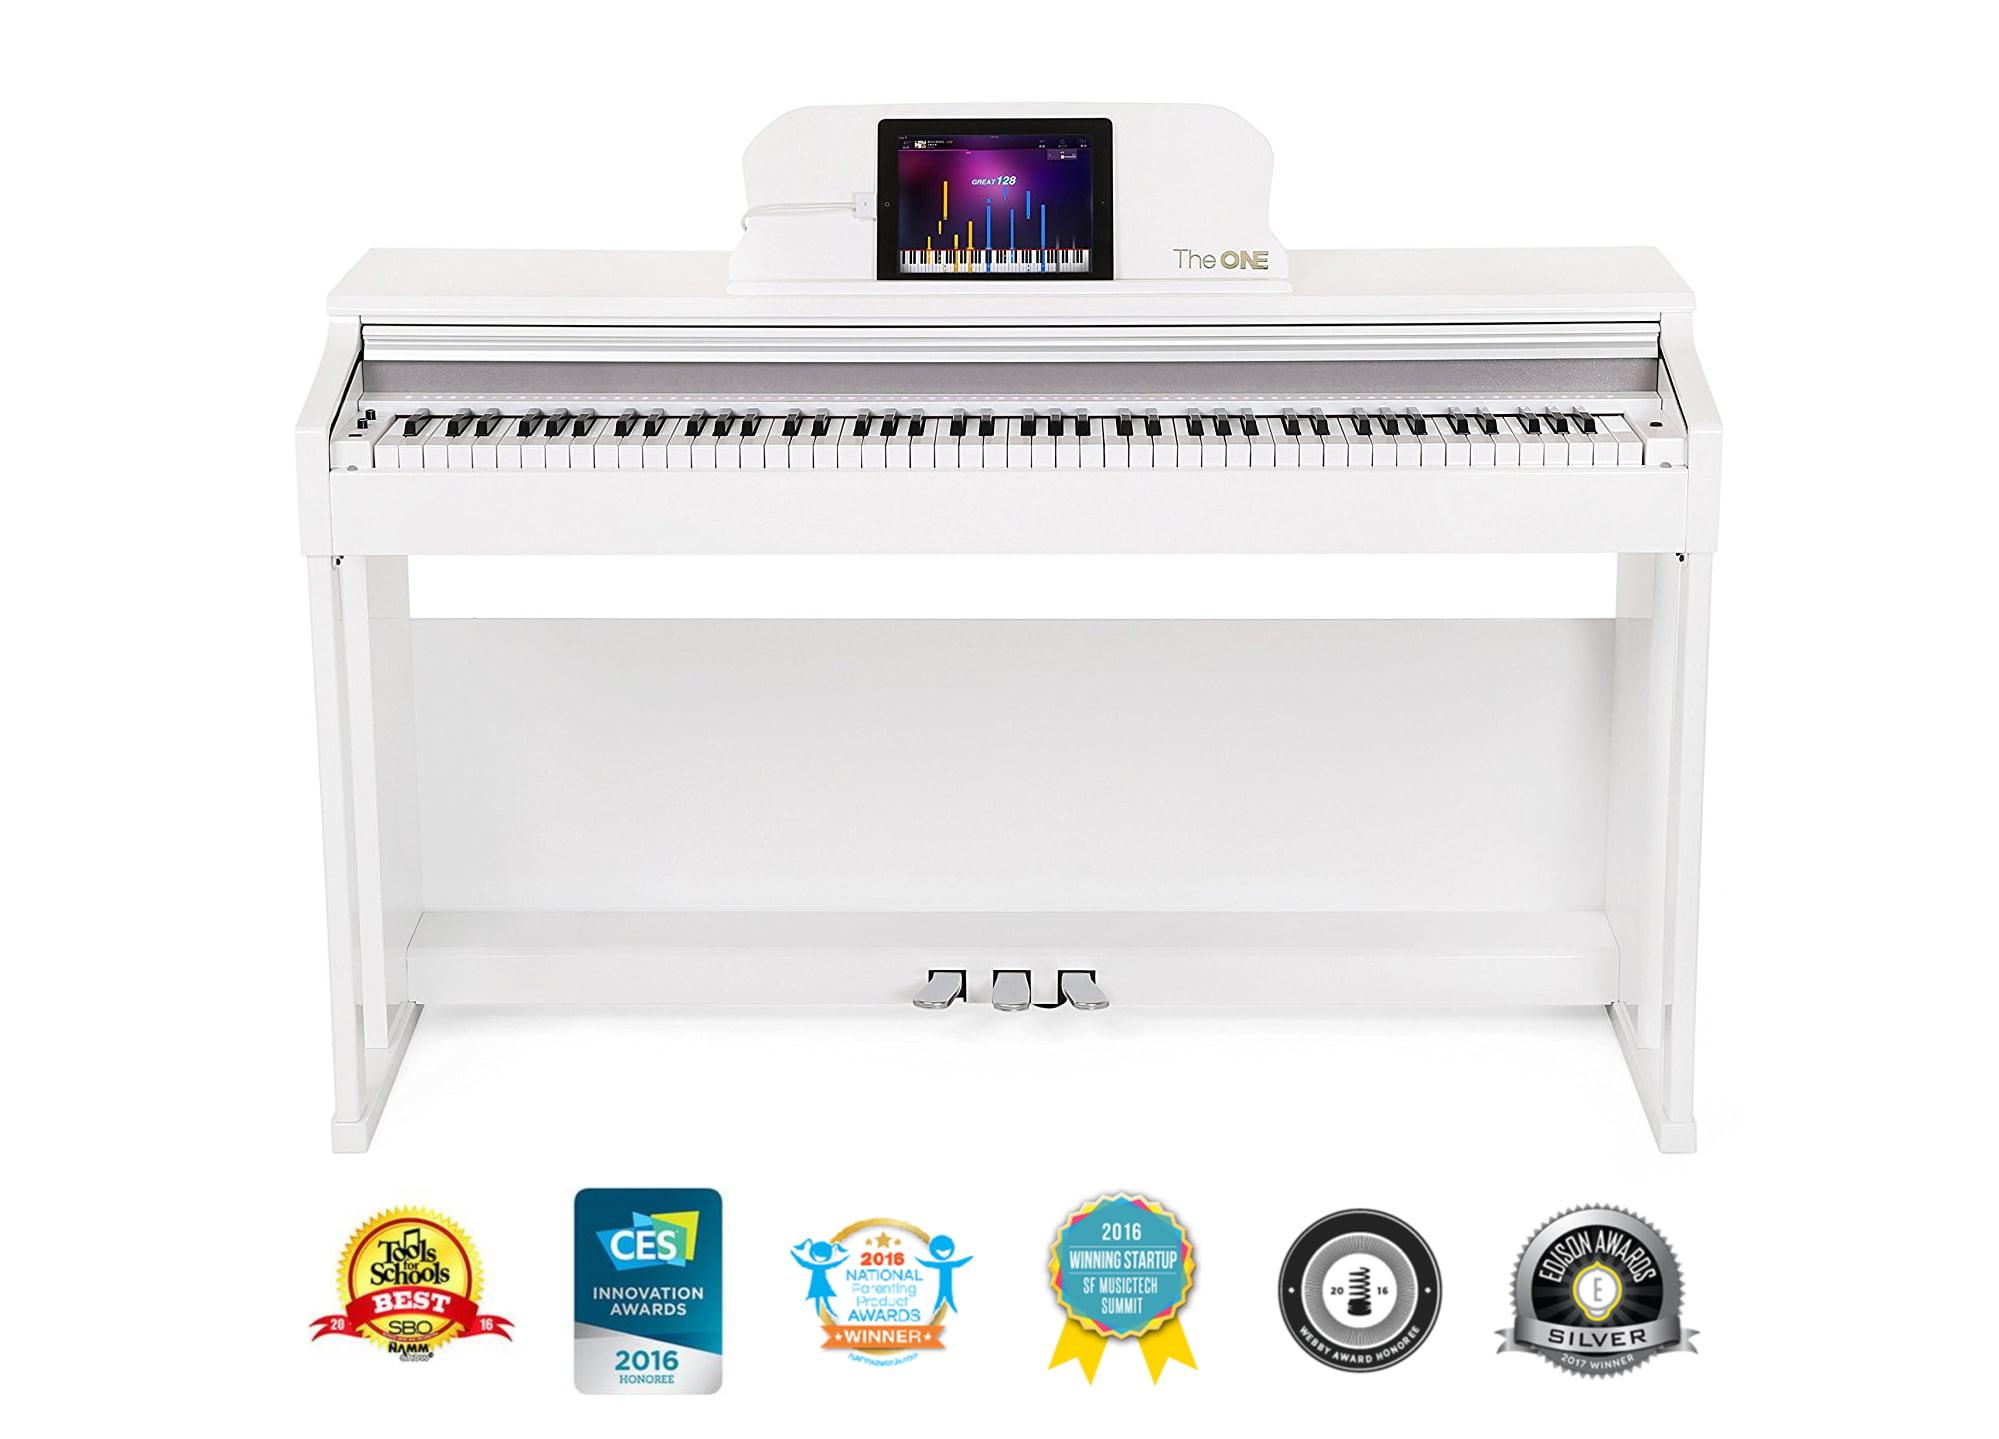 Click here to buy The ONE Smart Piano 88-Key Upright Digital Piano, White by Wanaka Inc.